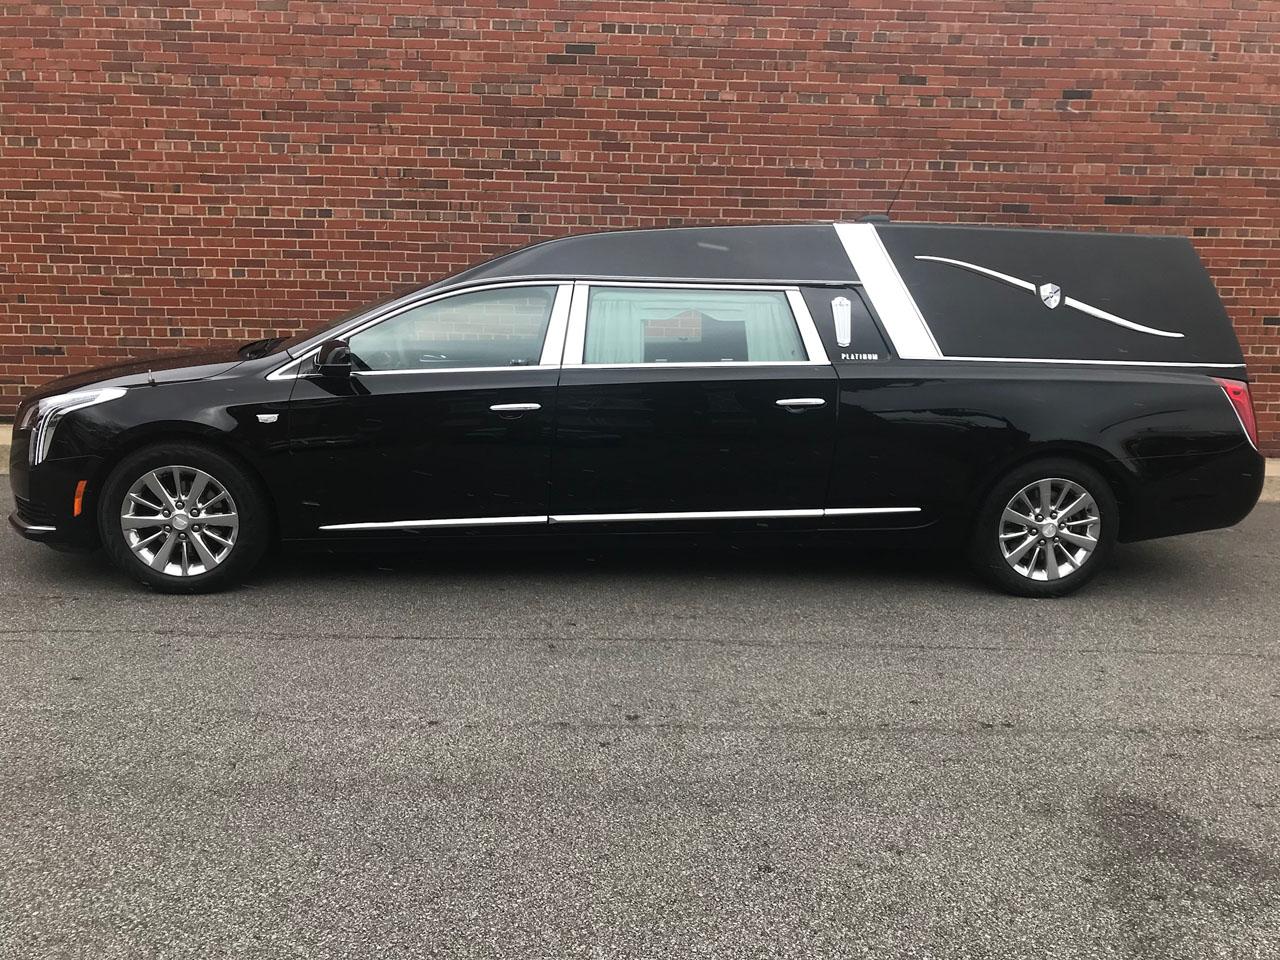 2018 Cadillac Platinum Phoenix Hearse